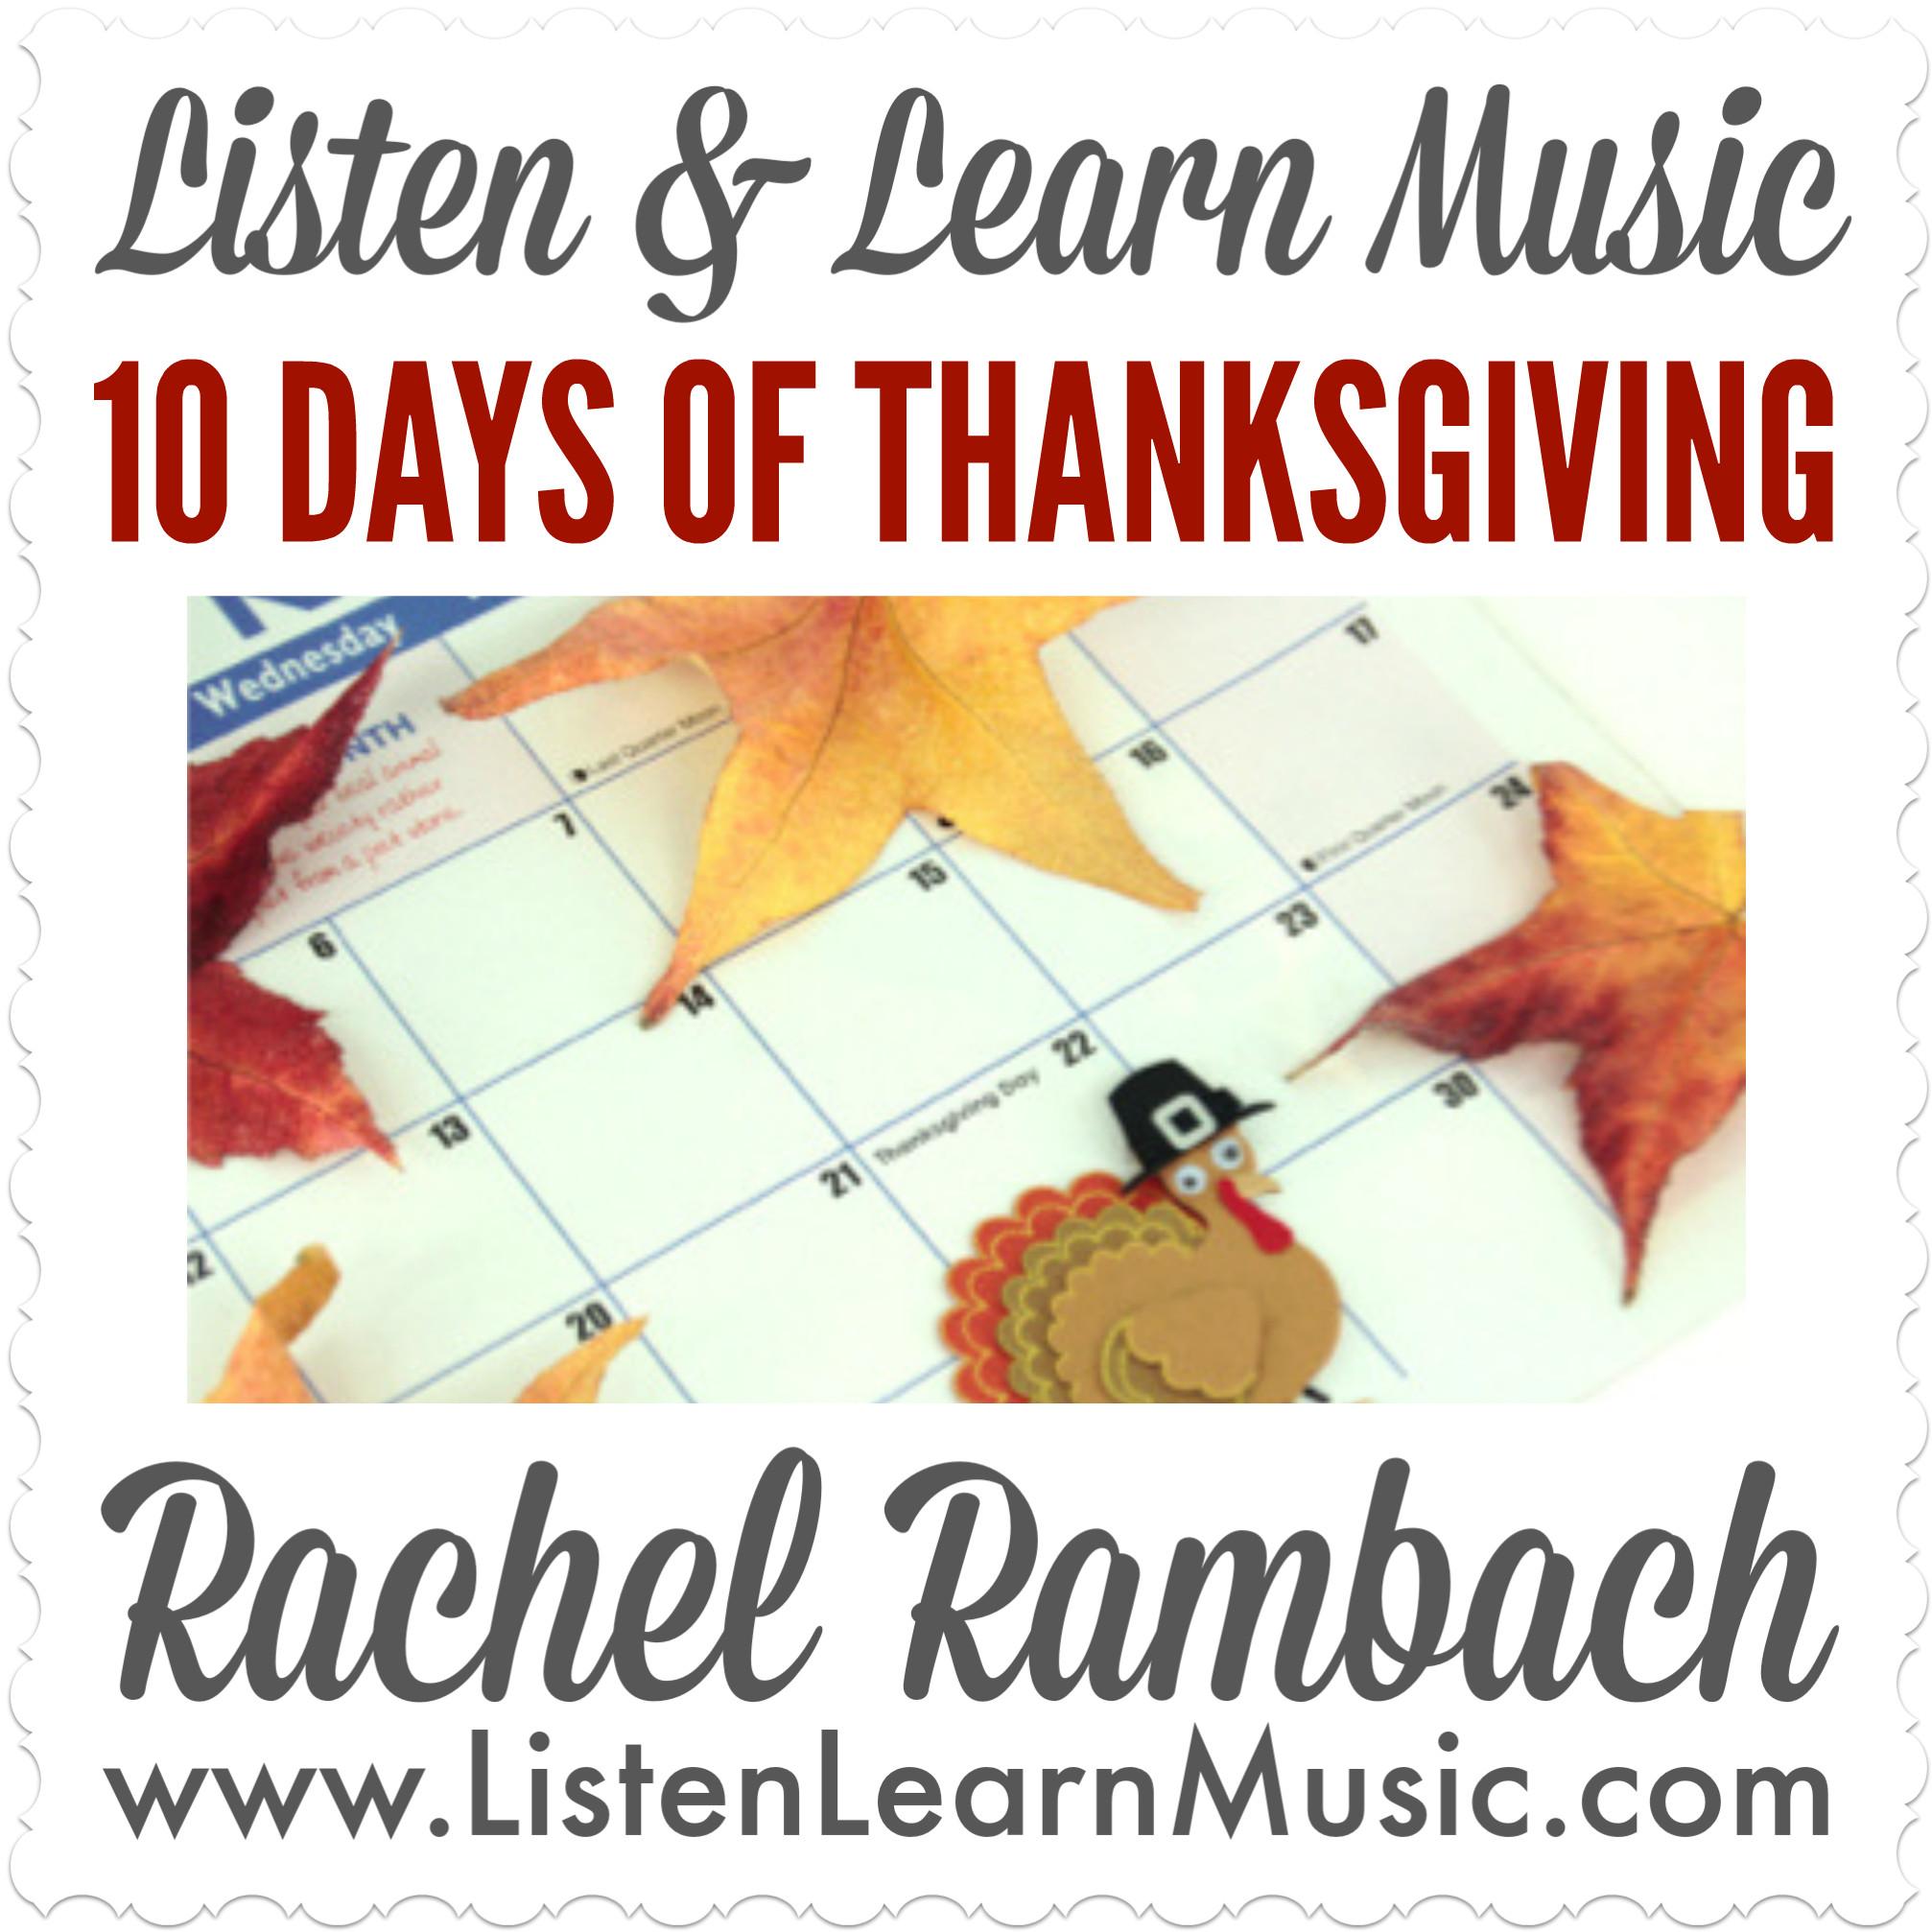 10 Days of Thanksgiving | Listen & Learn Music